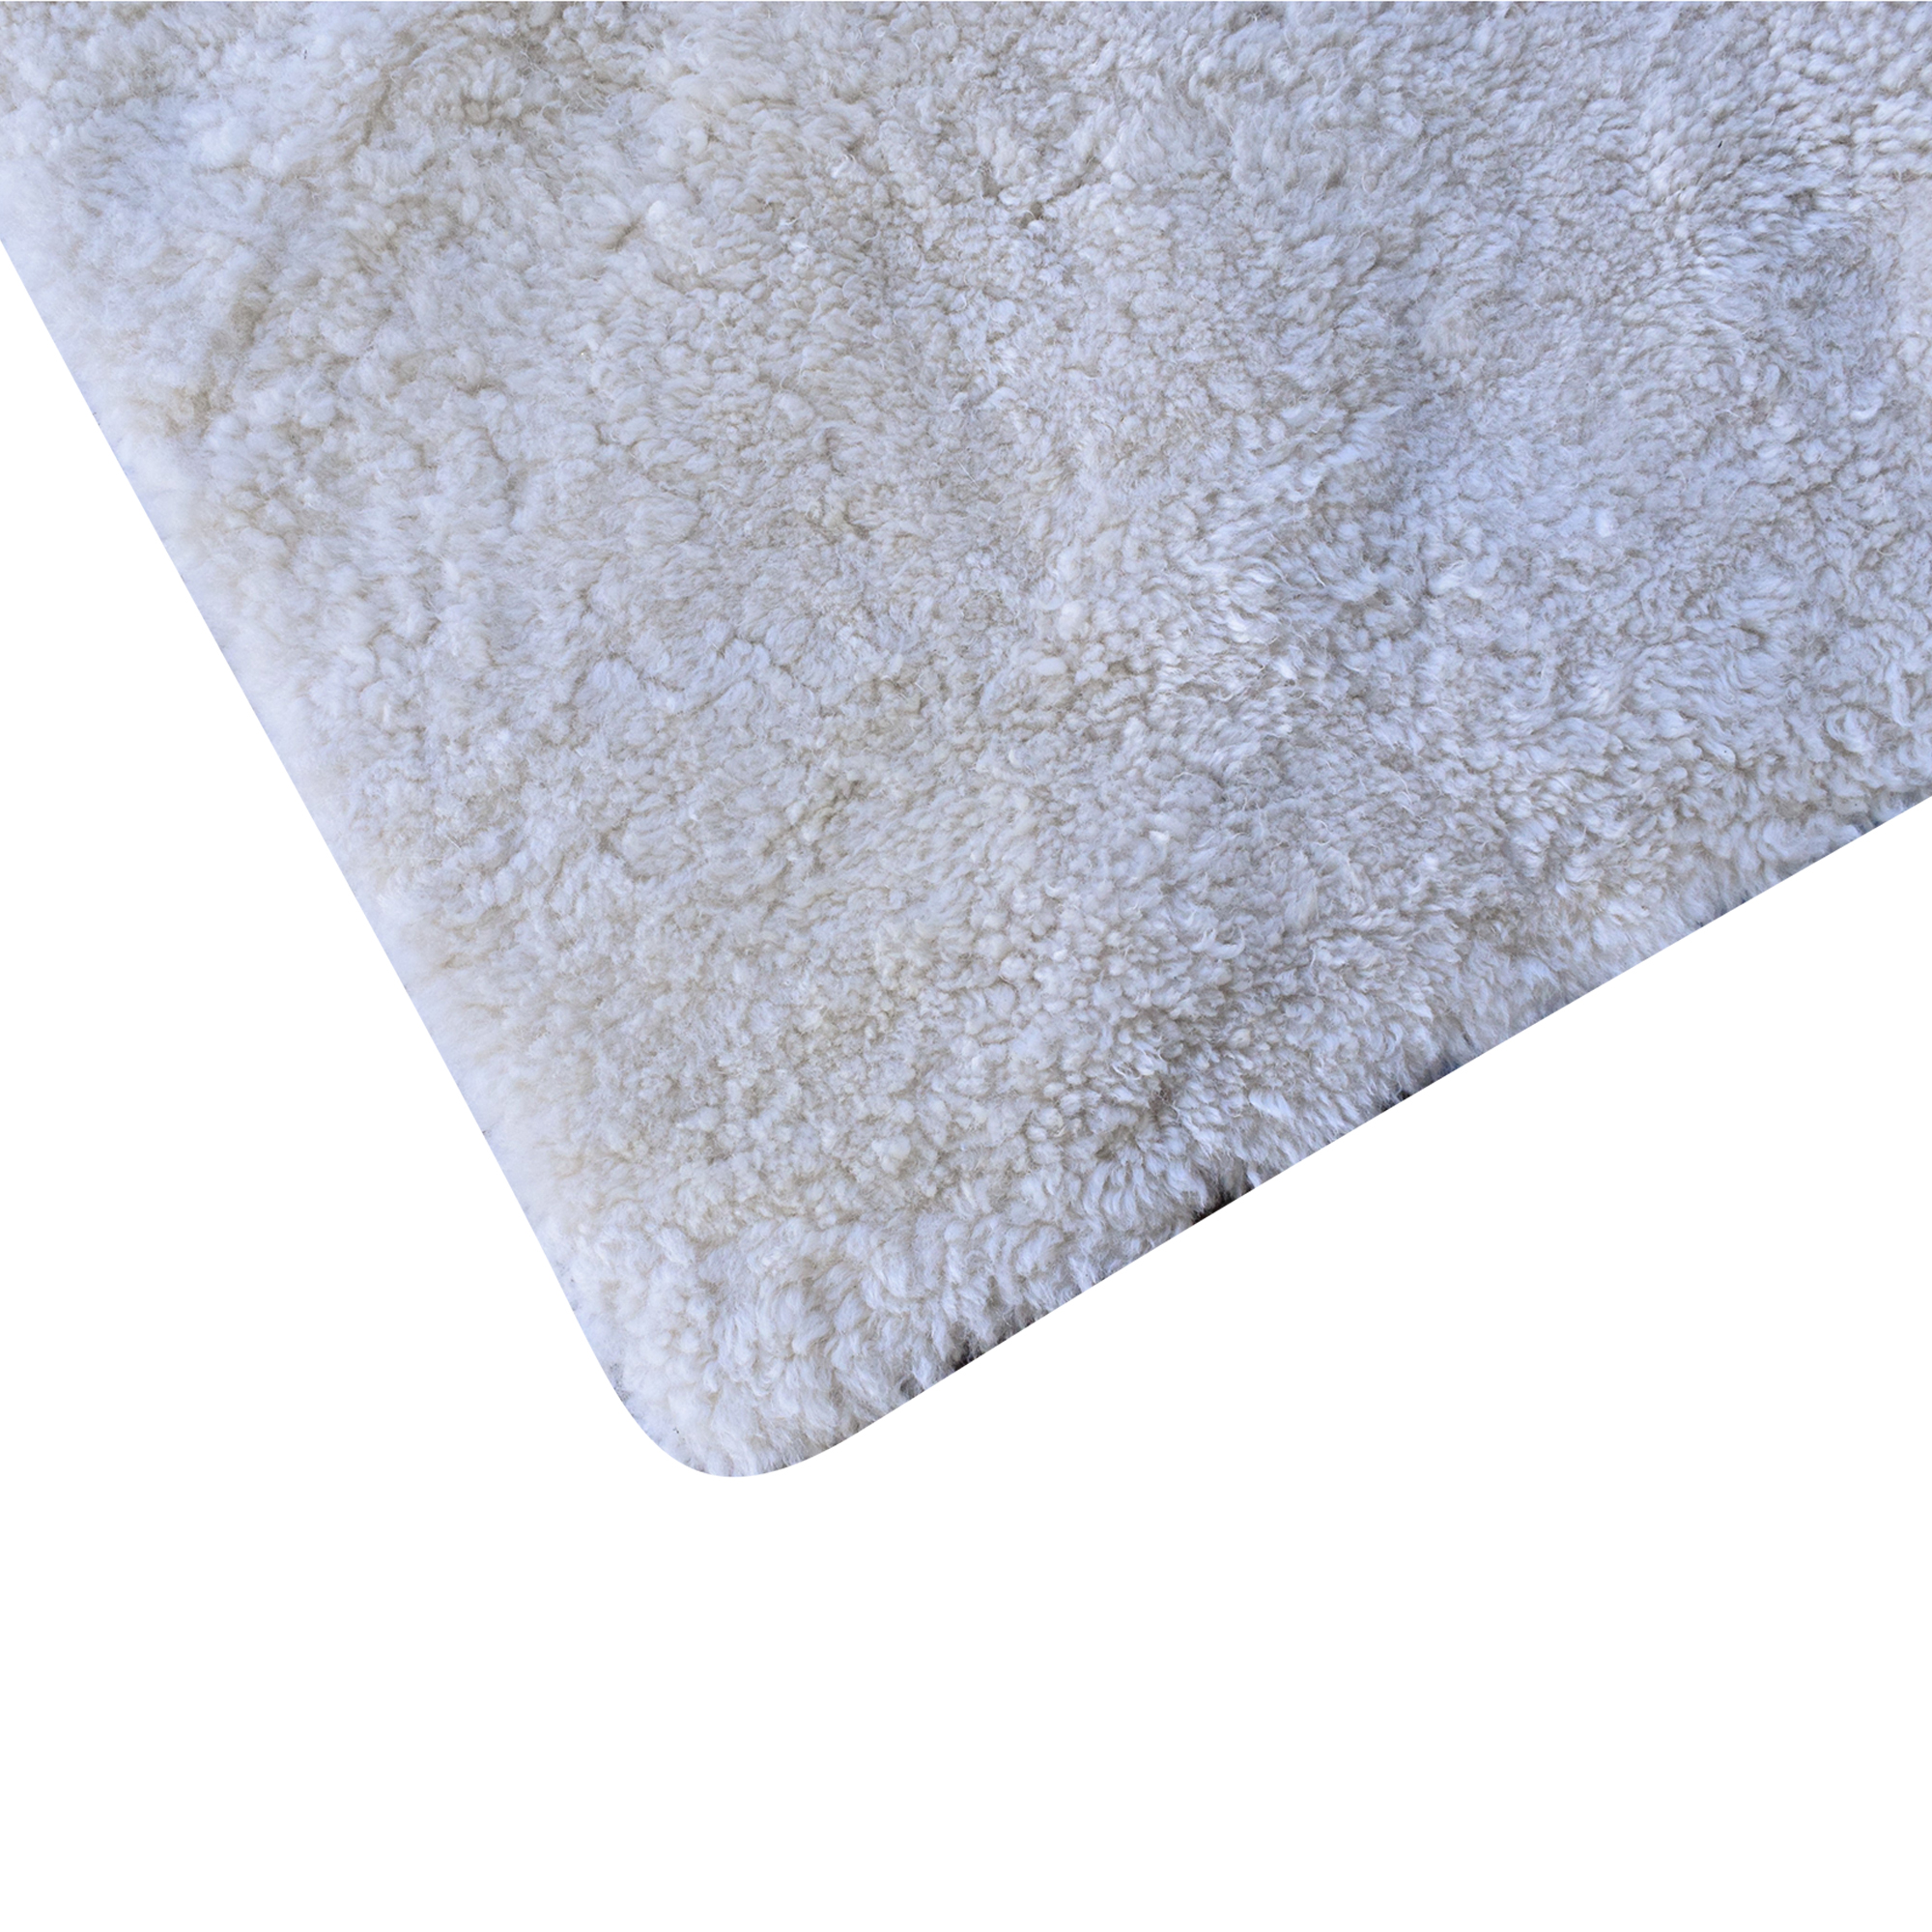 RH Baby & Child Restoration Hardware Curly Wool Sheepskin Rug for sale